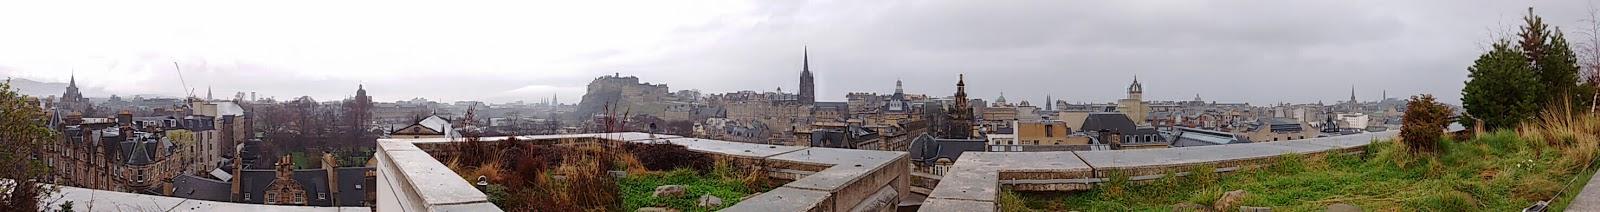 Edinburgh Panoramic, National Museum of Scotland roof views